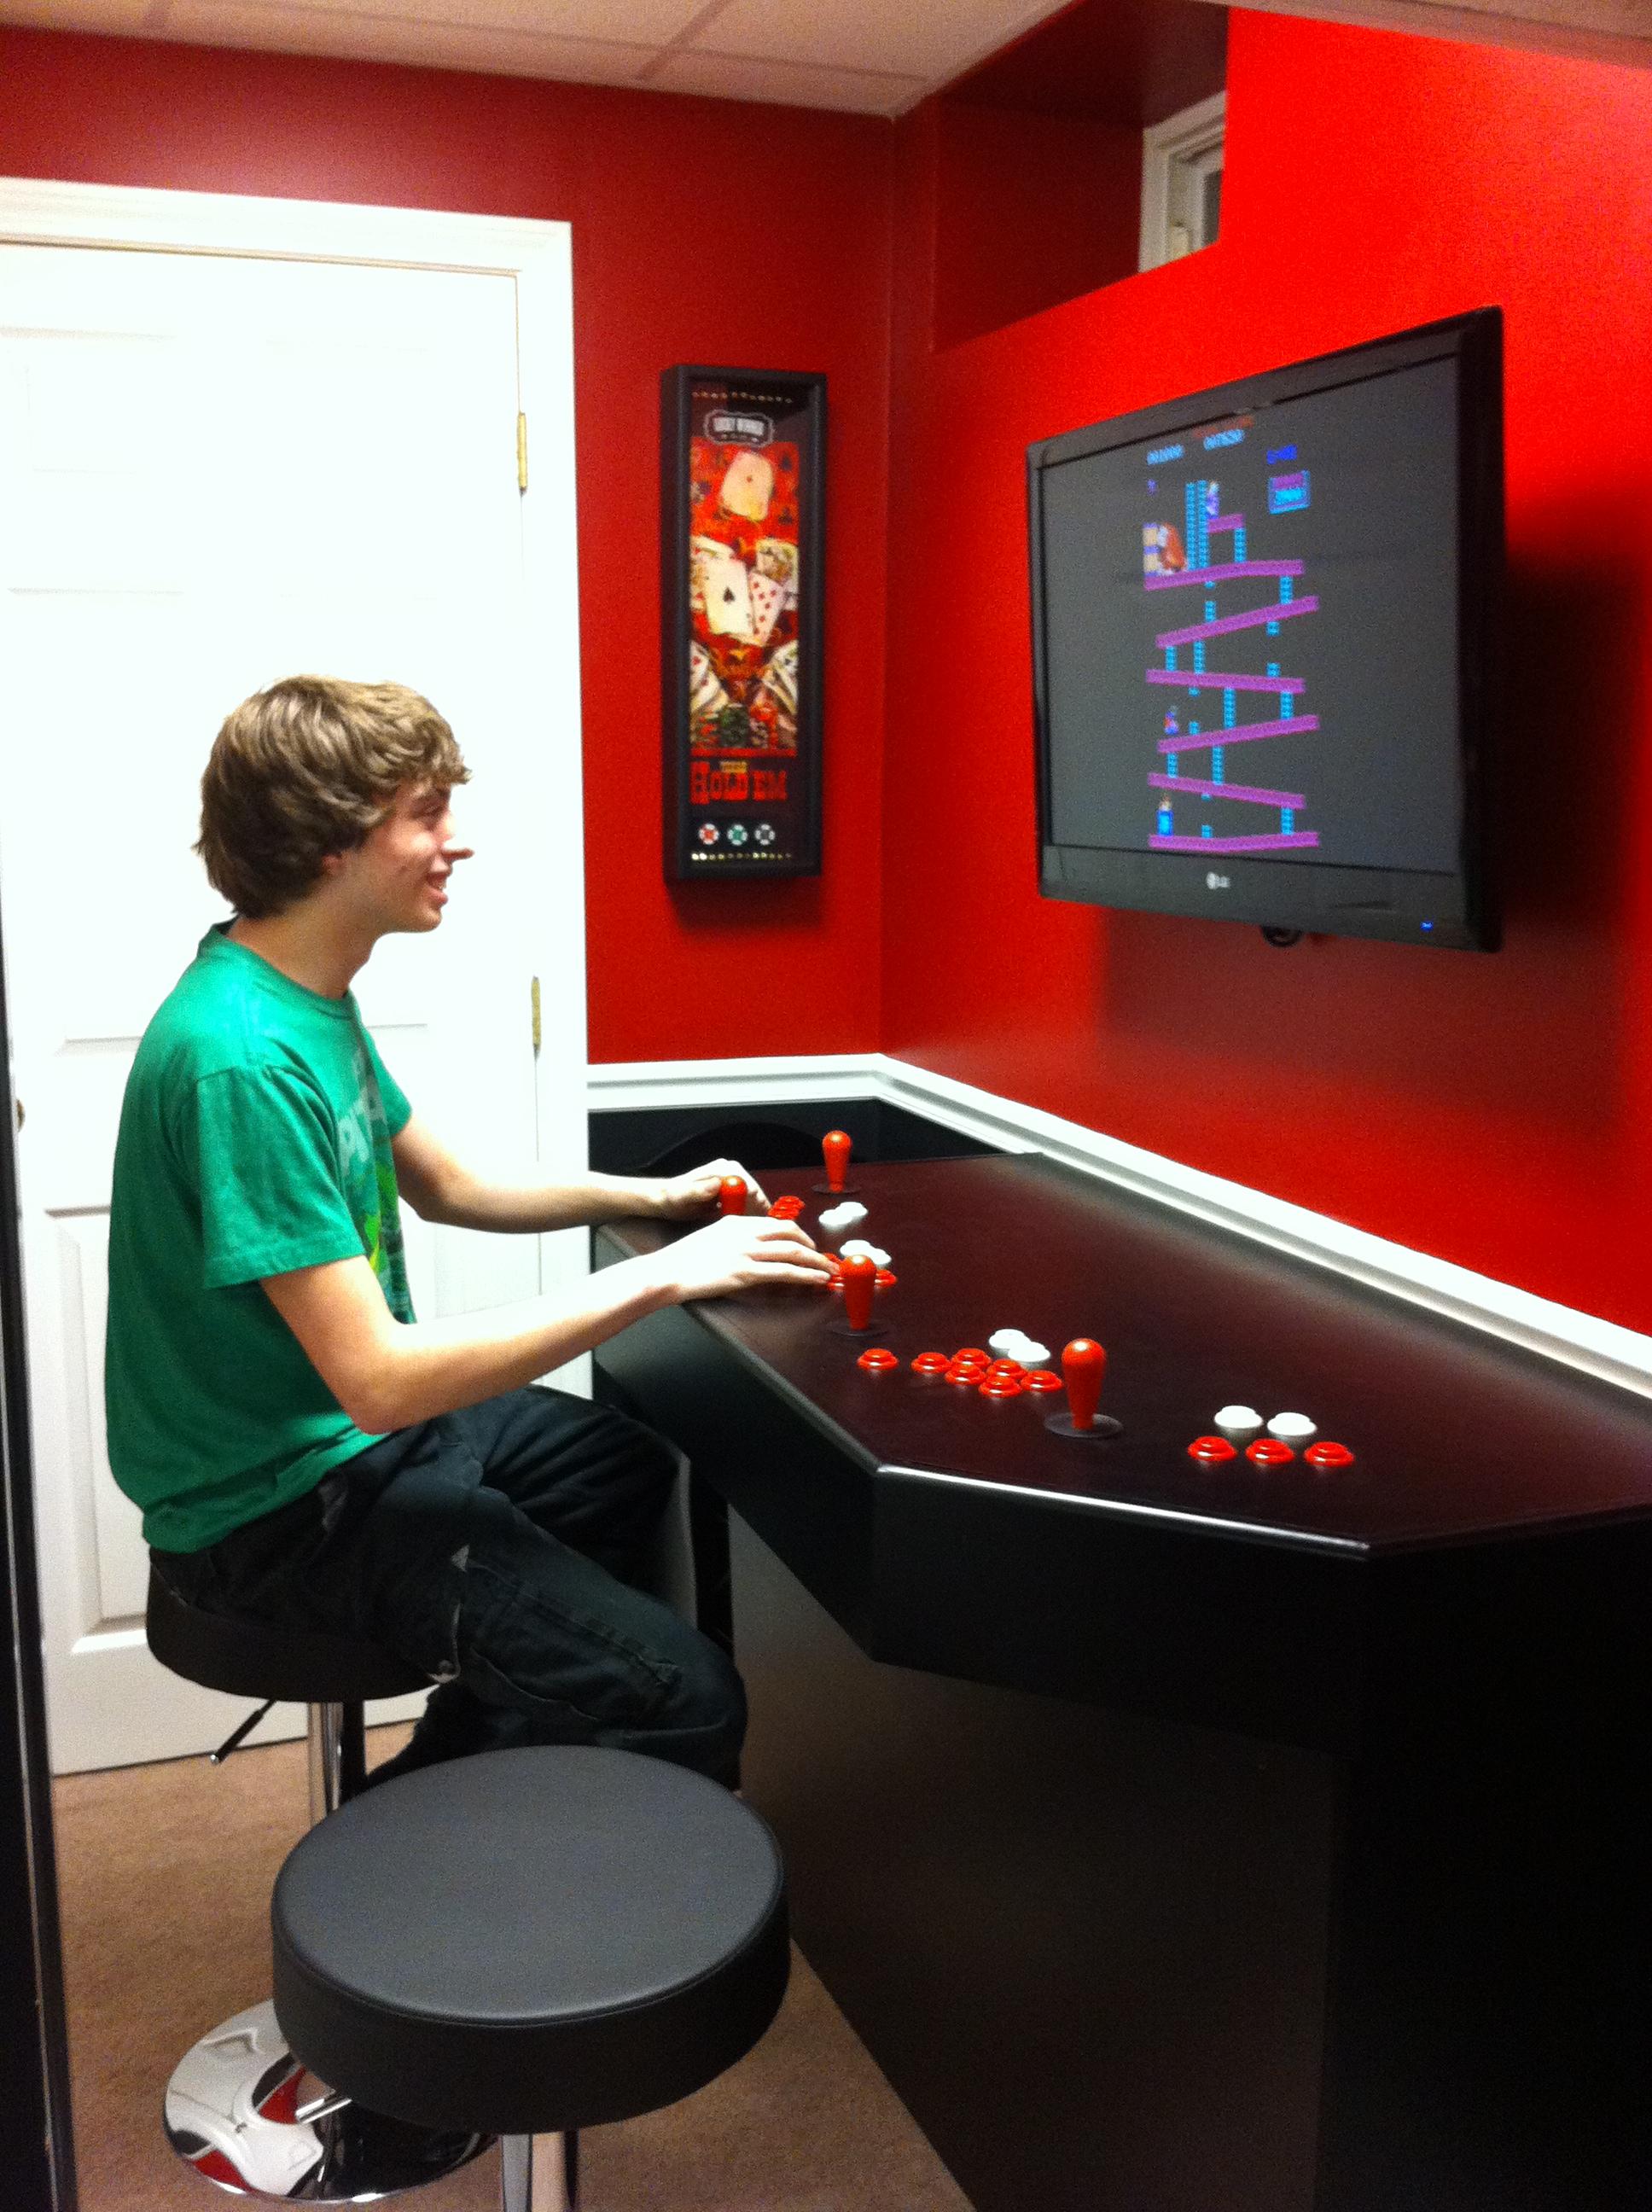 4 Player Arcade Cabinet Kit Mame Pedestal Cabinet Cabinets Matttroy